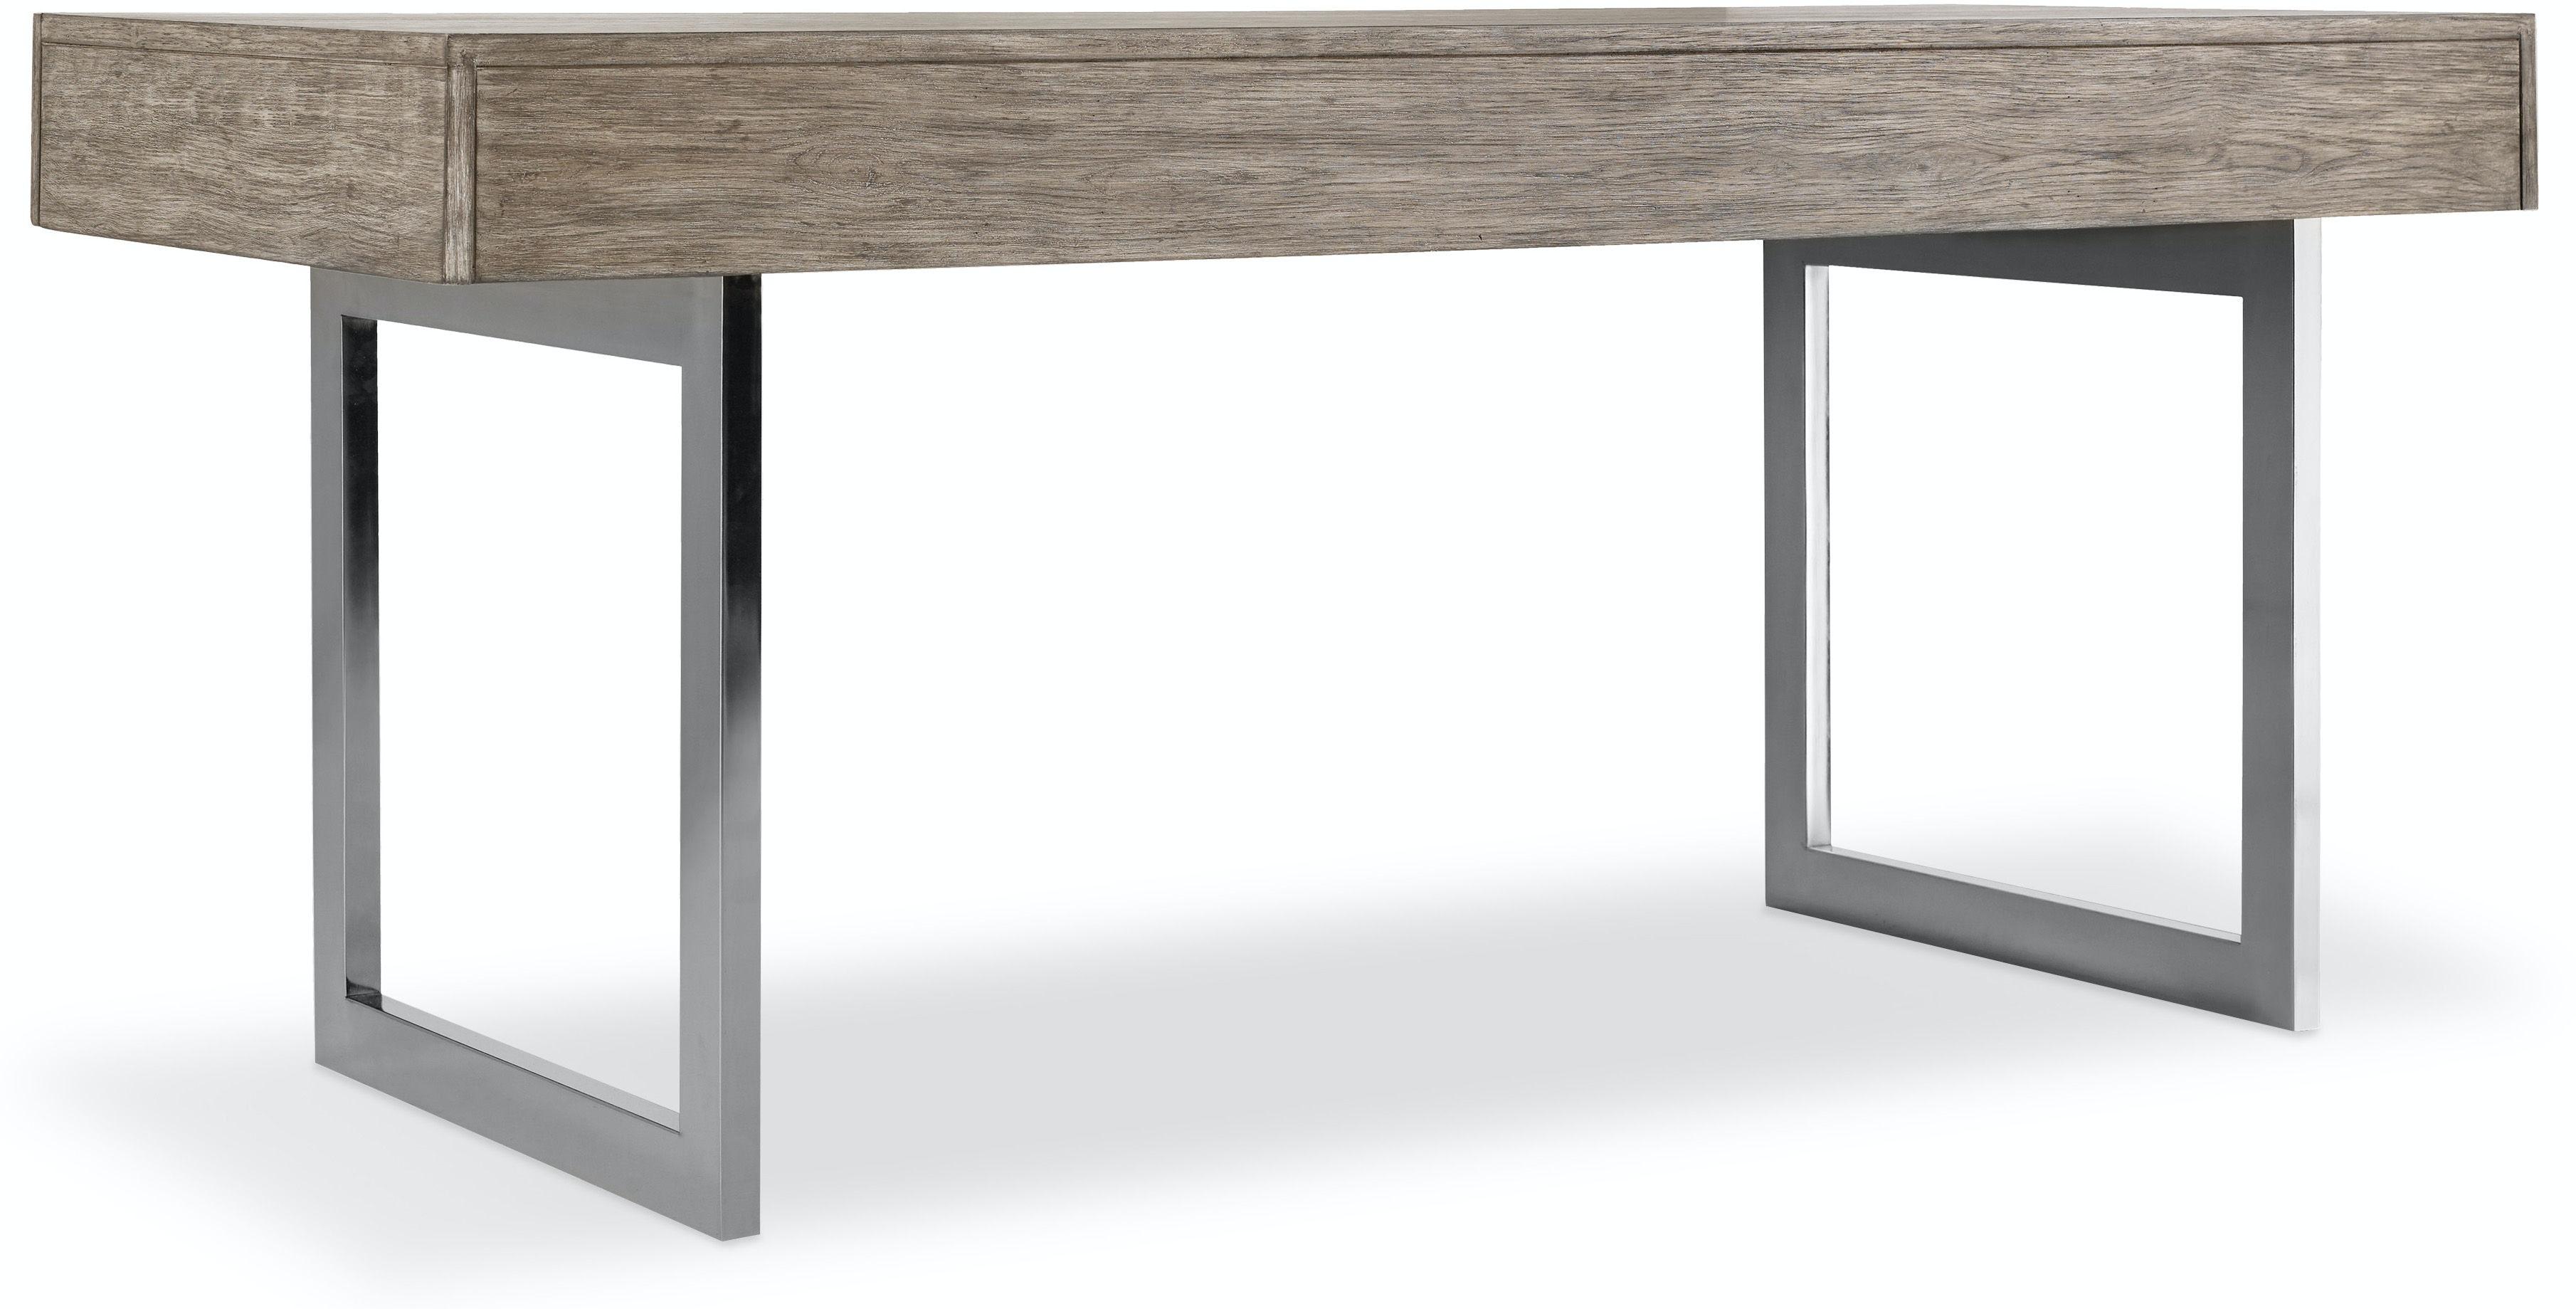 Hooker Furniture Home Office Curata Leg Desk 1600 10459 Mwd